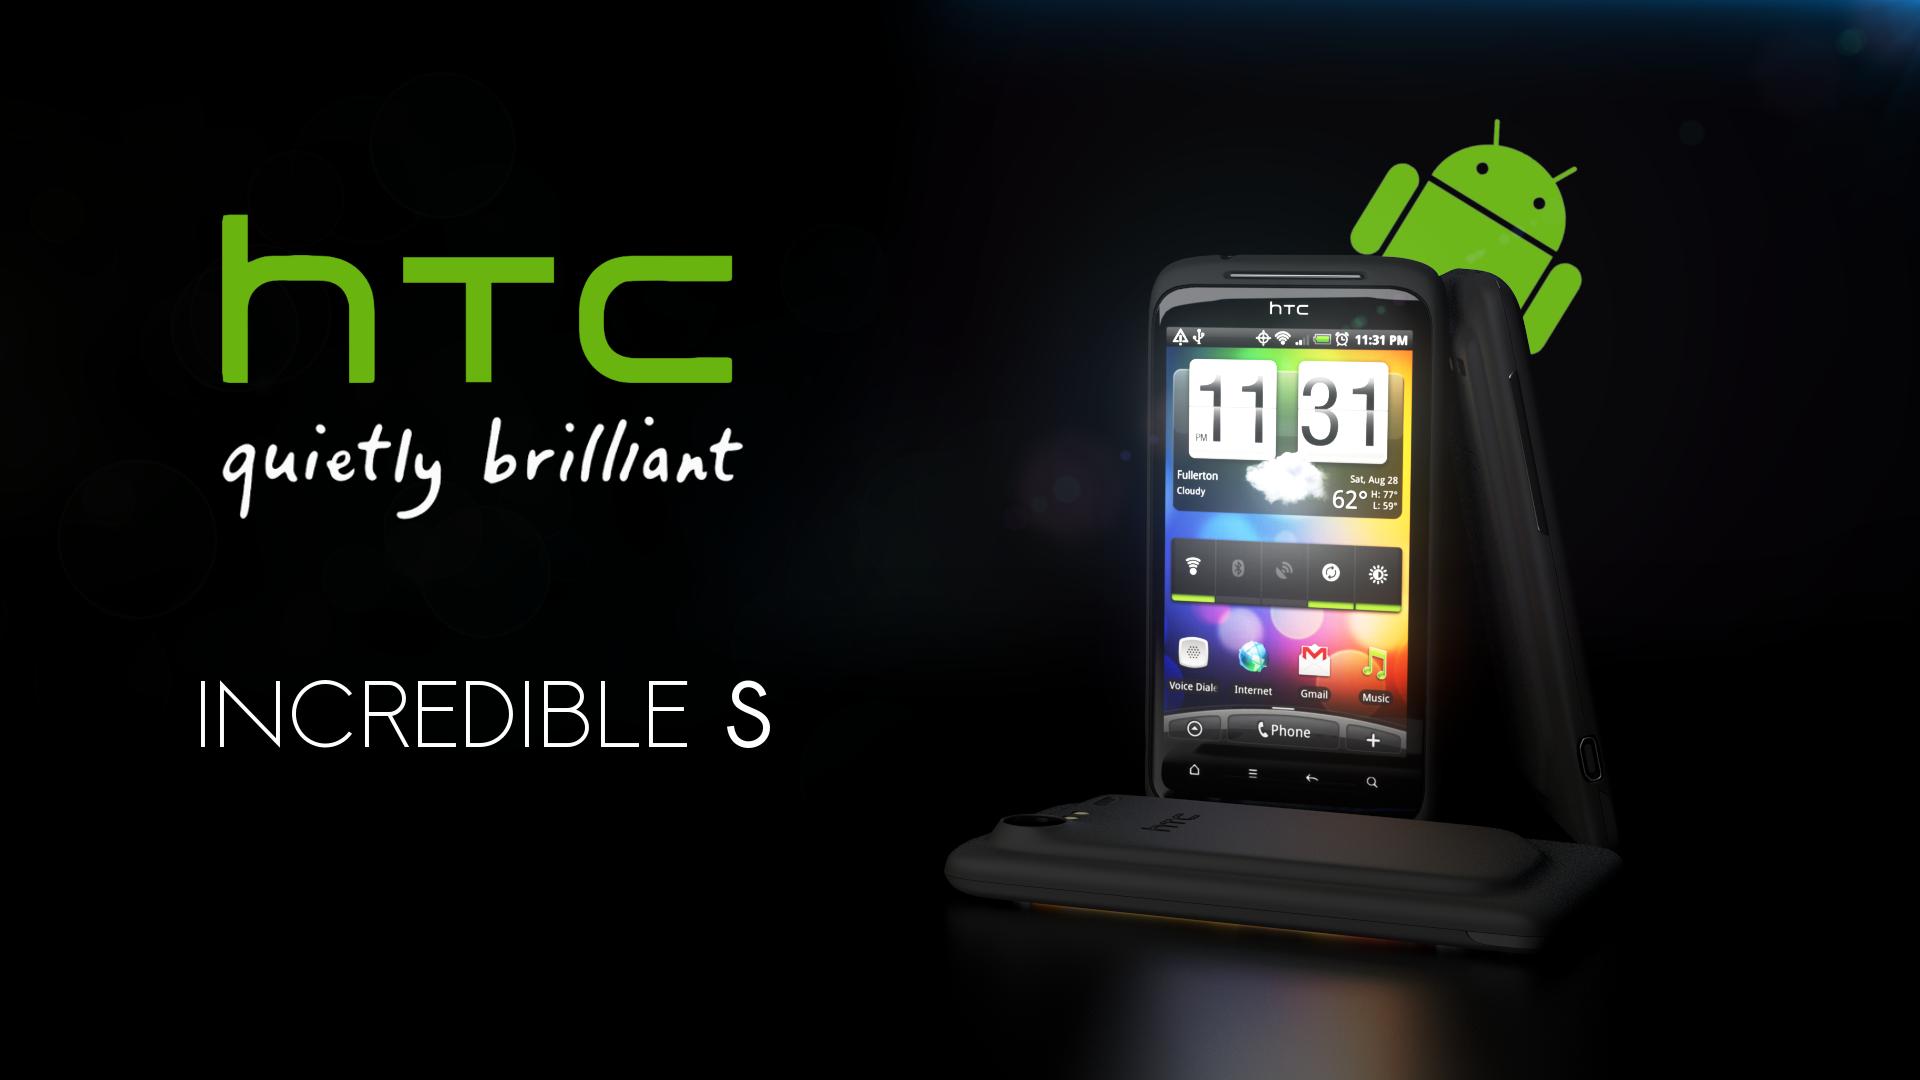 HTC Incredible S by LubomirCenovsky